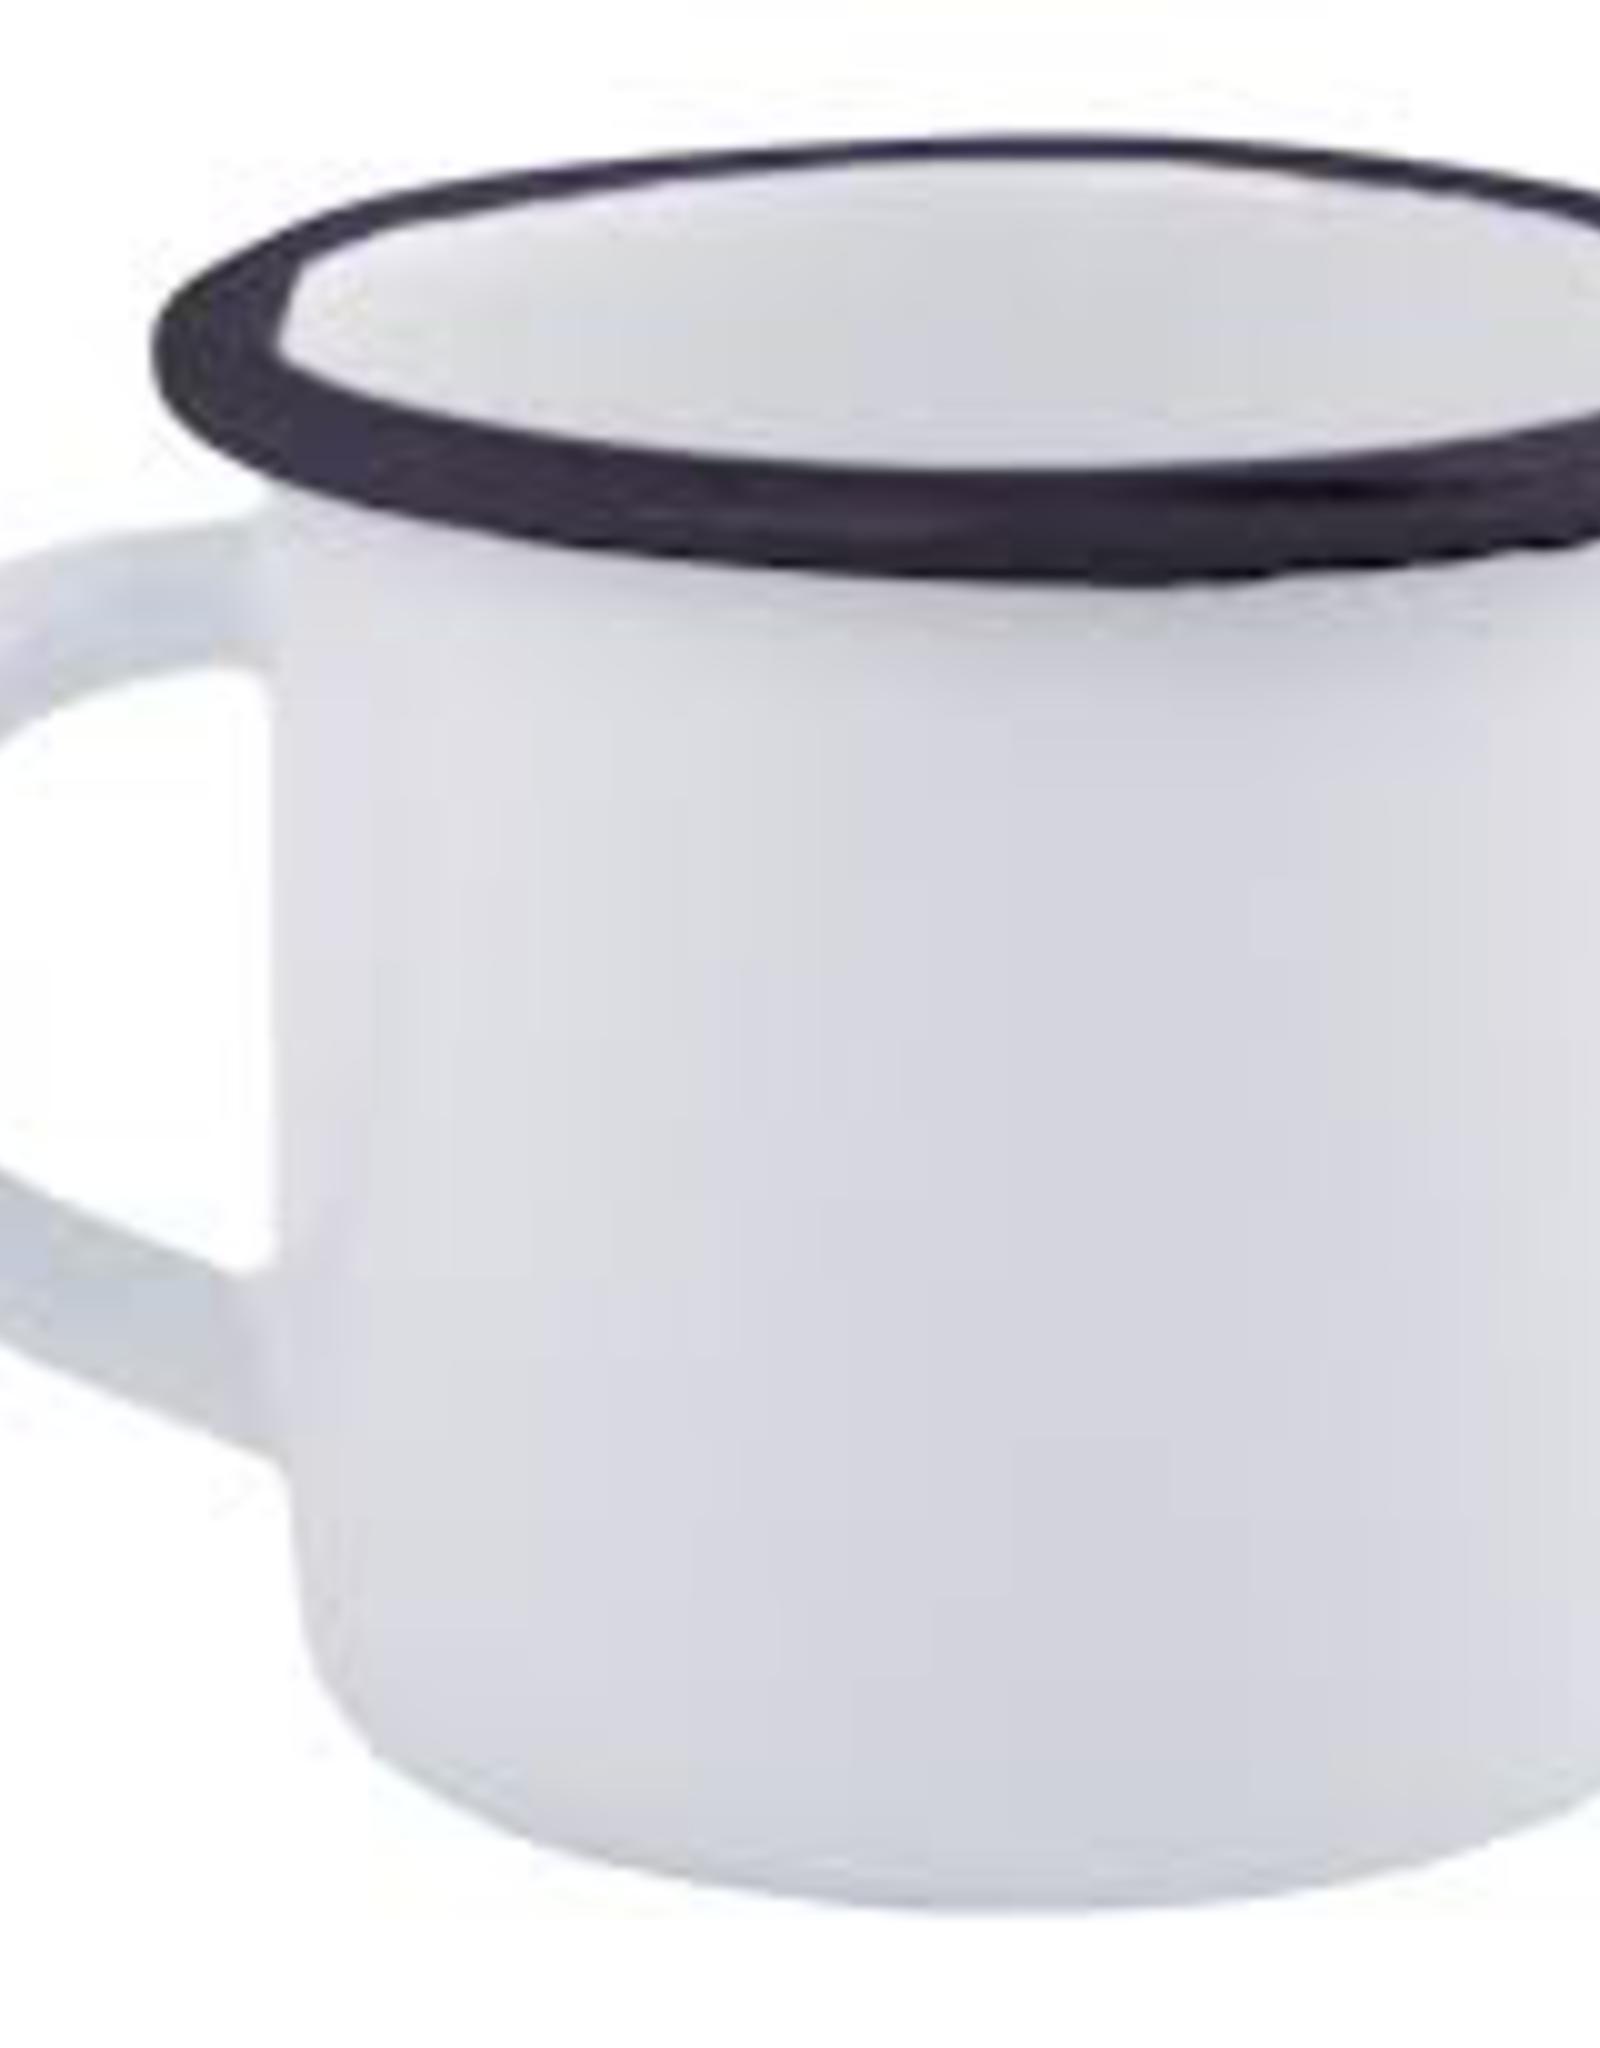 Enamel Drink Cup